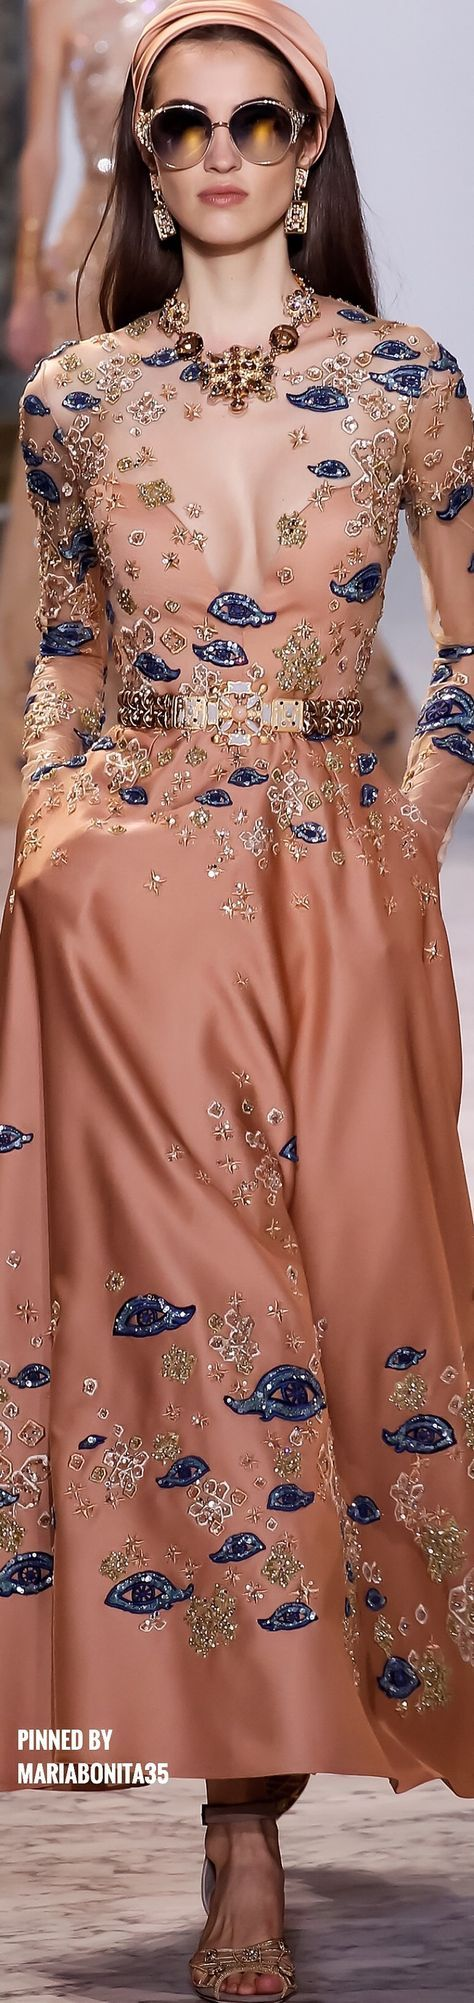 DesertRose,;;Beautiful dress,;,